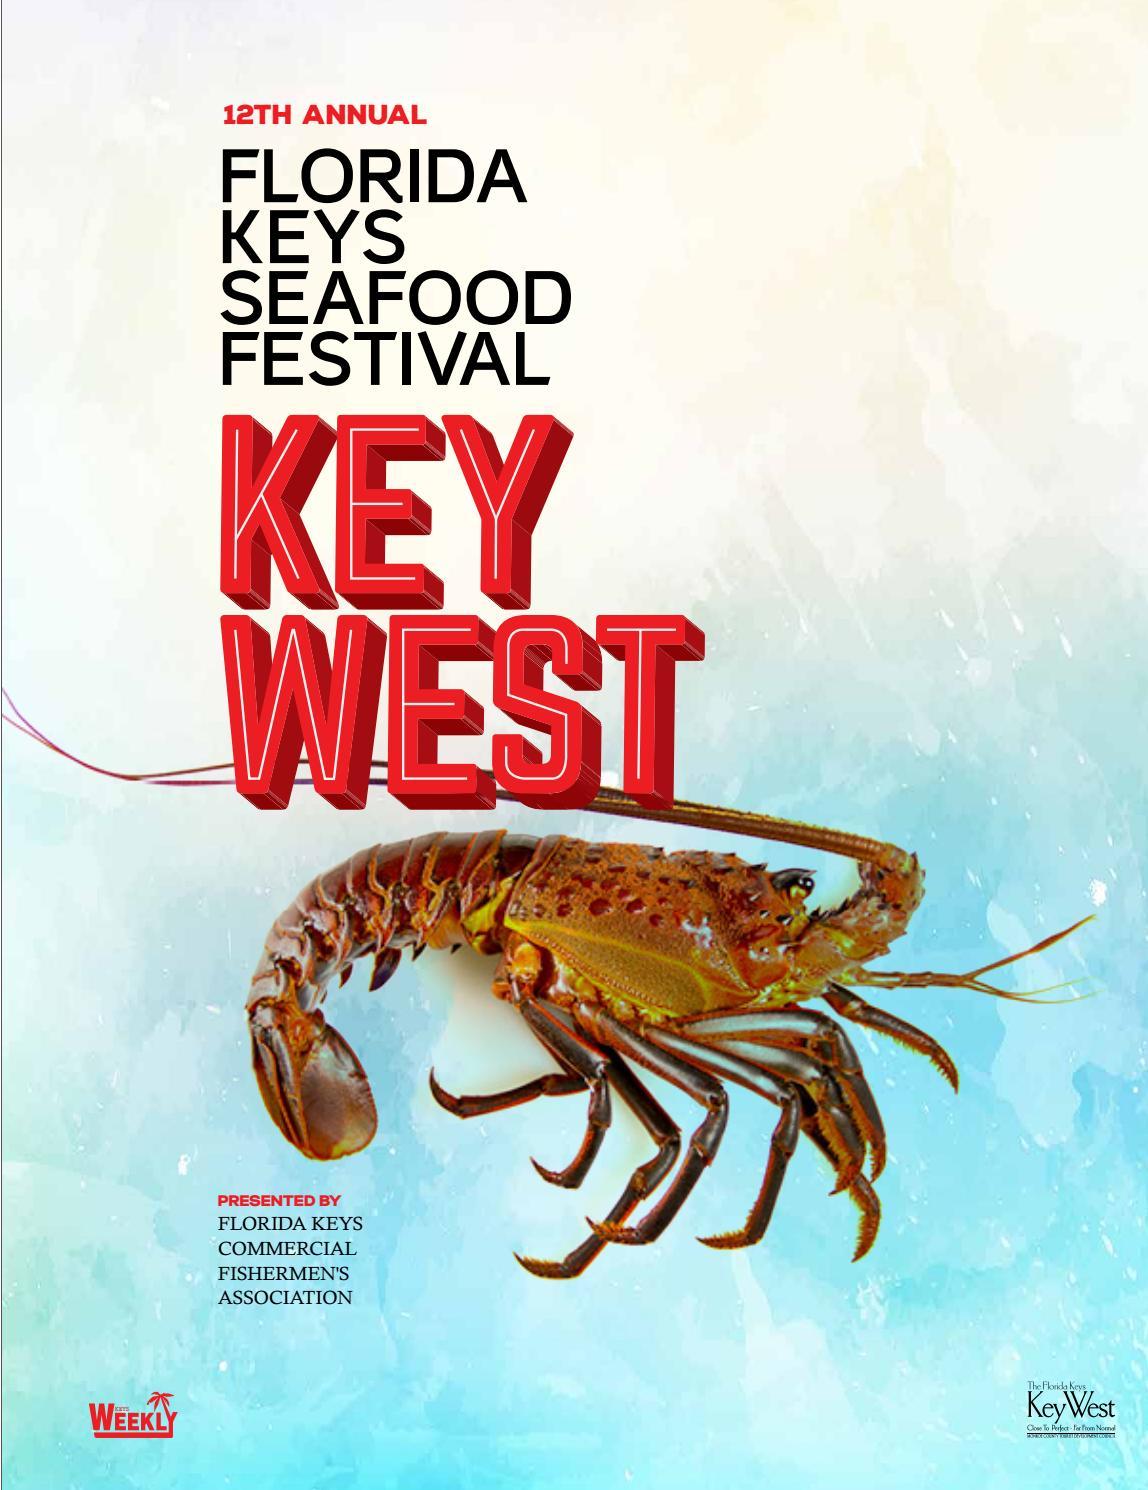 Key West Seafood Festival Guide By Keys Weekly Newspapers